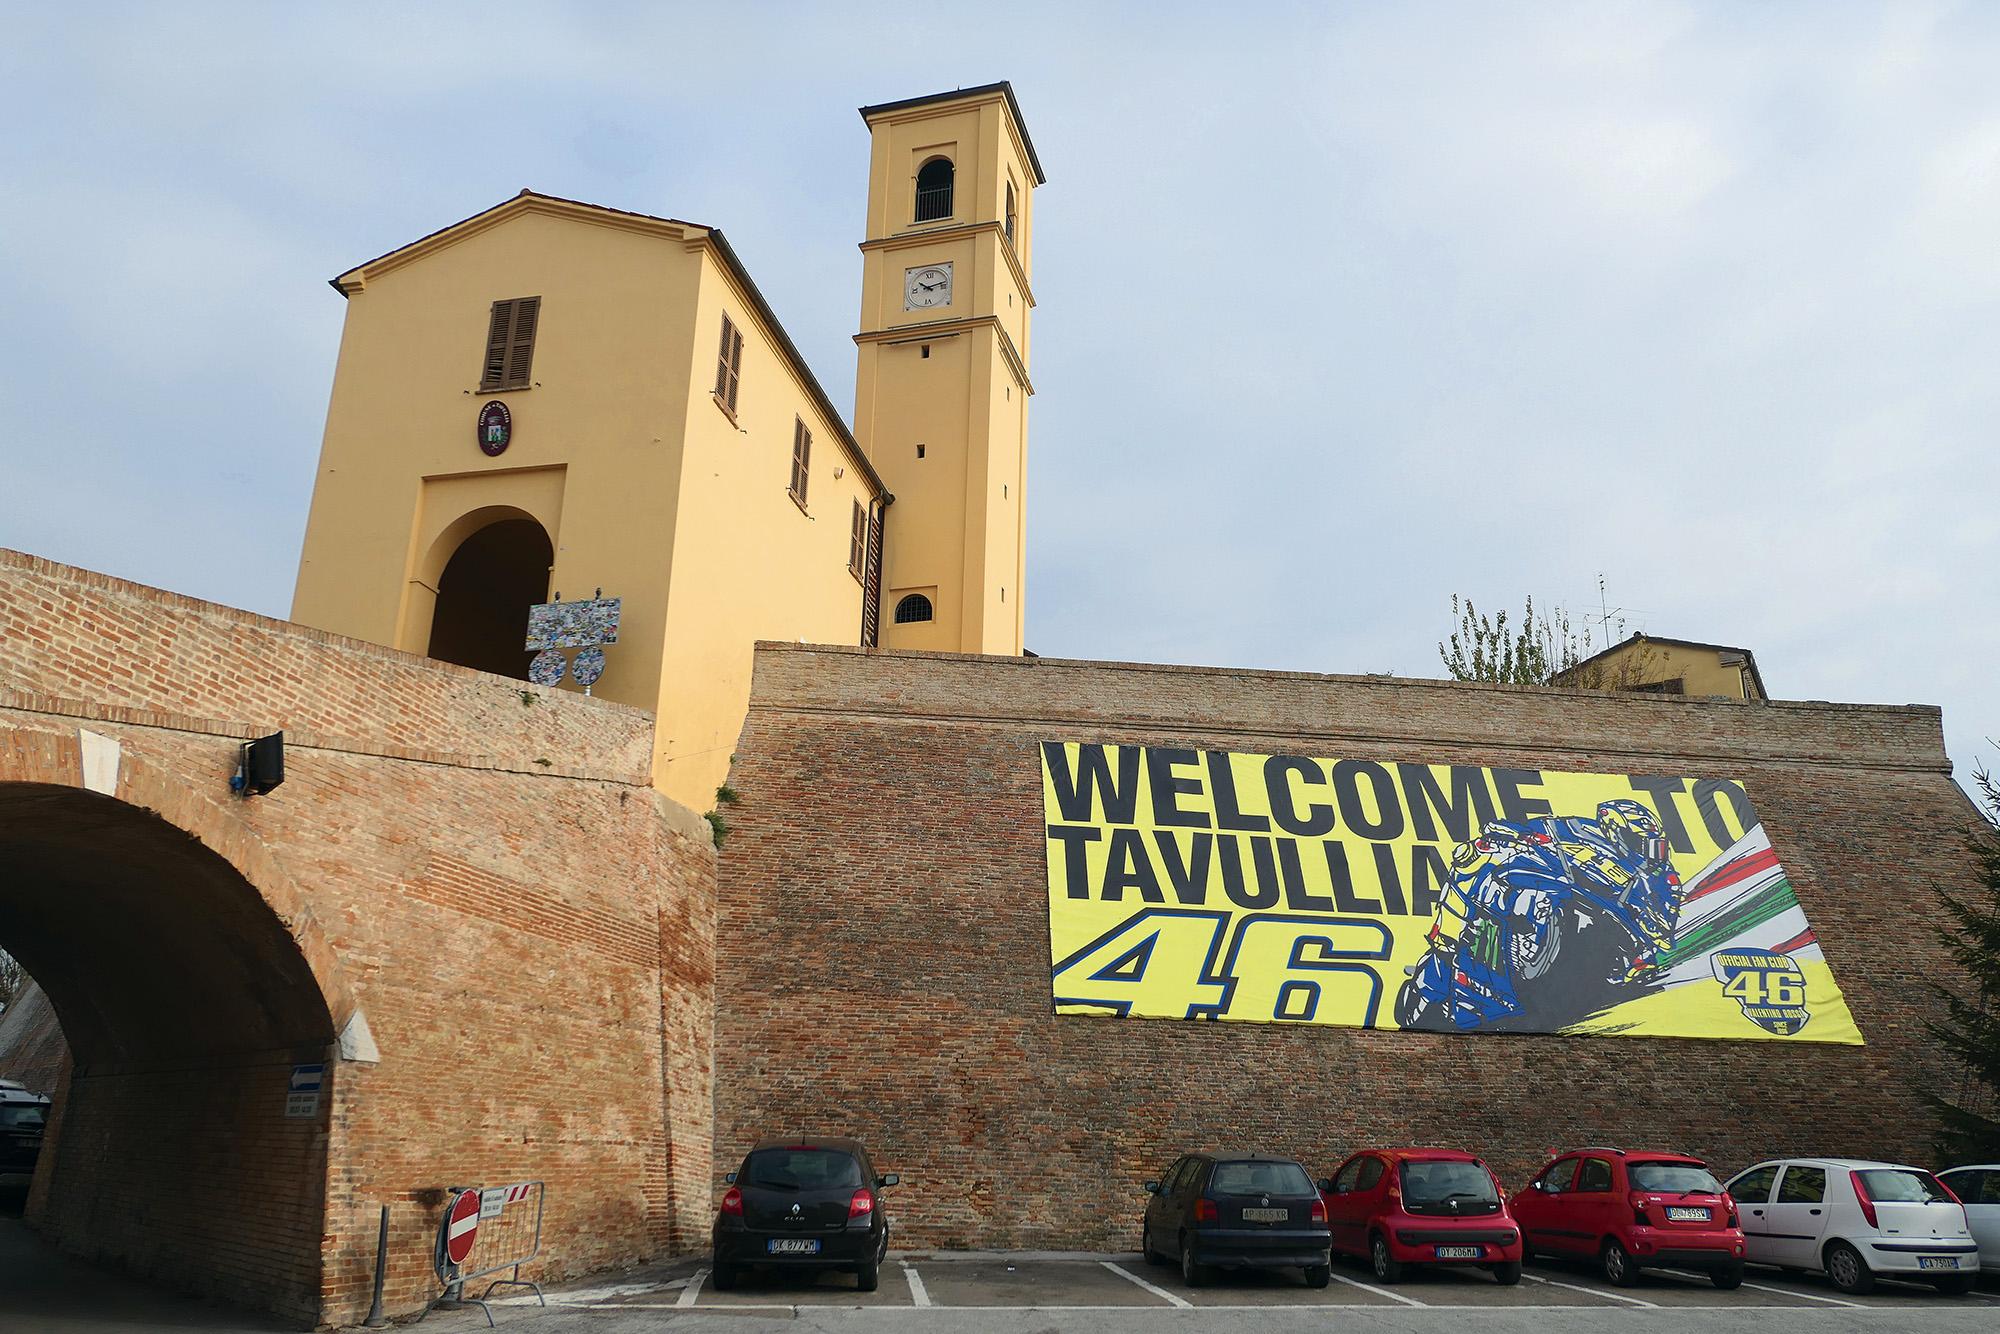 VR46 banner in Tavullia